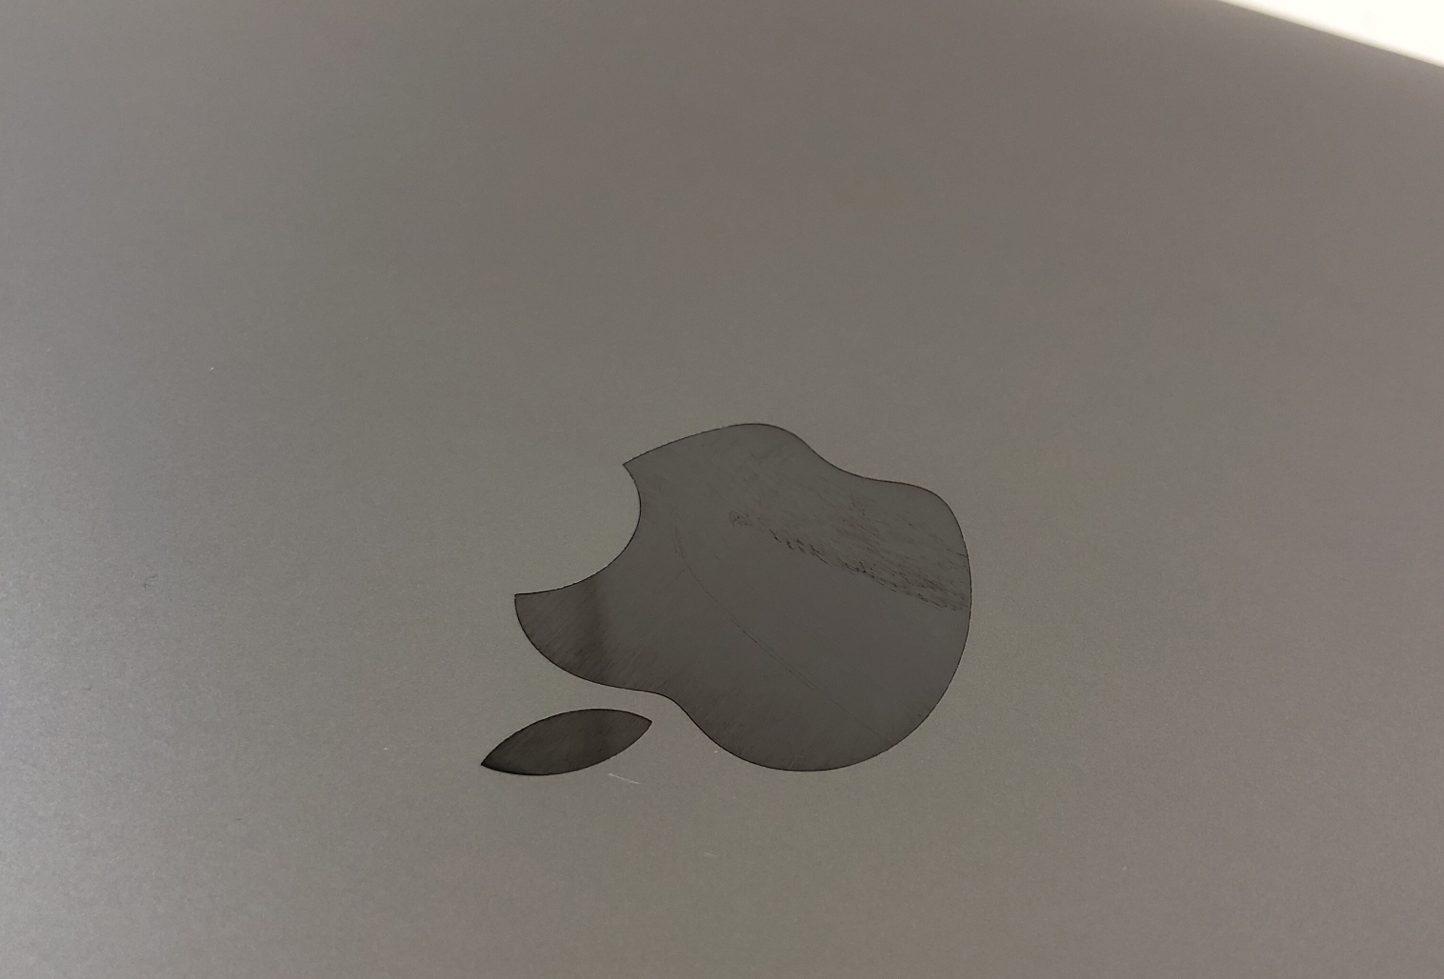 "MacBook Pro 13"" 2TBT Late 2016 (Intel Core i5 2.0 GHz 8 GB RAM 256 GB SSD), Space Gray, Intel Core i5 2.0 GHz, 8 GB RAM, 256 GB SSD, Kuva 3"